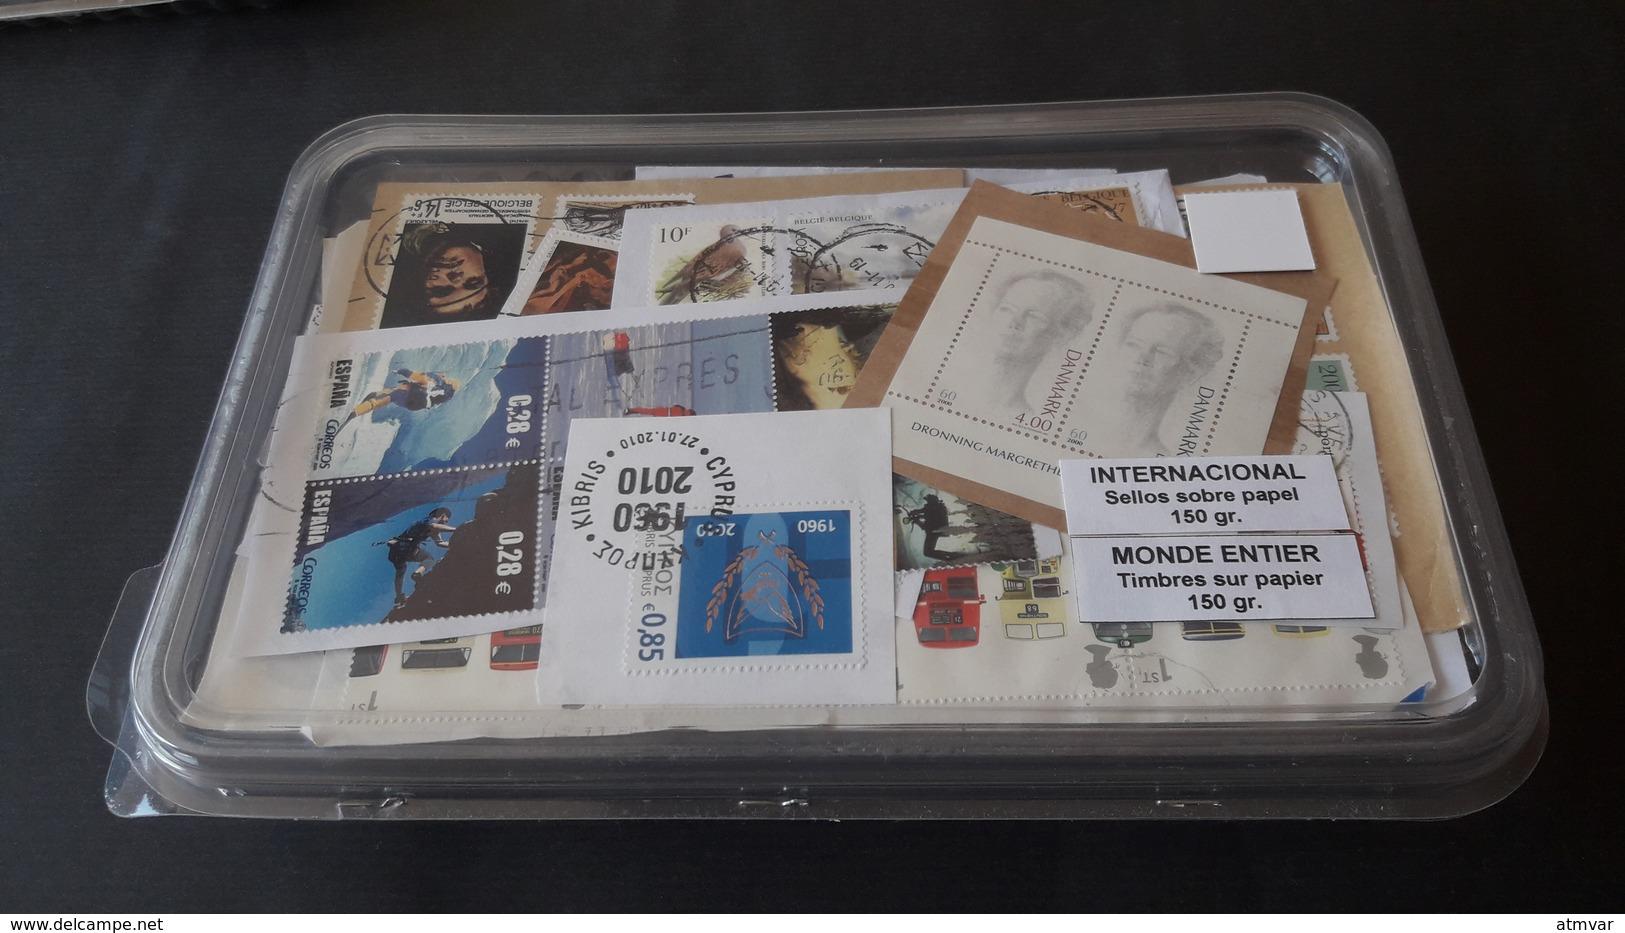 WORLDWIDE - KILOWARE 150 G. Sellos Usados, Con Papel / Used Stamps, On Paper / Timbres Oblitérés, Sur Papier - Mezclas (max 999 Sellos)